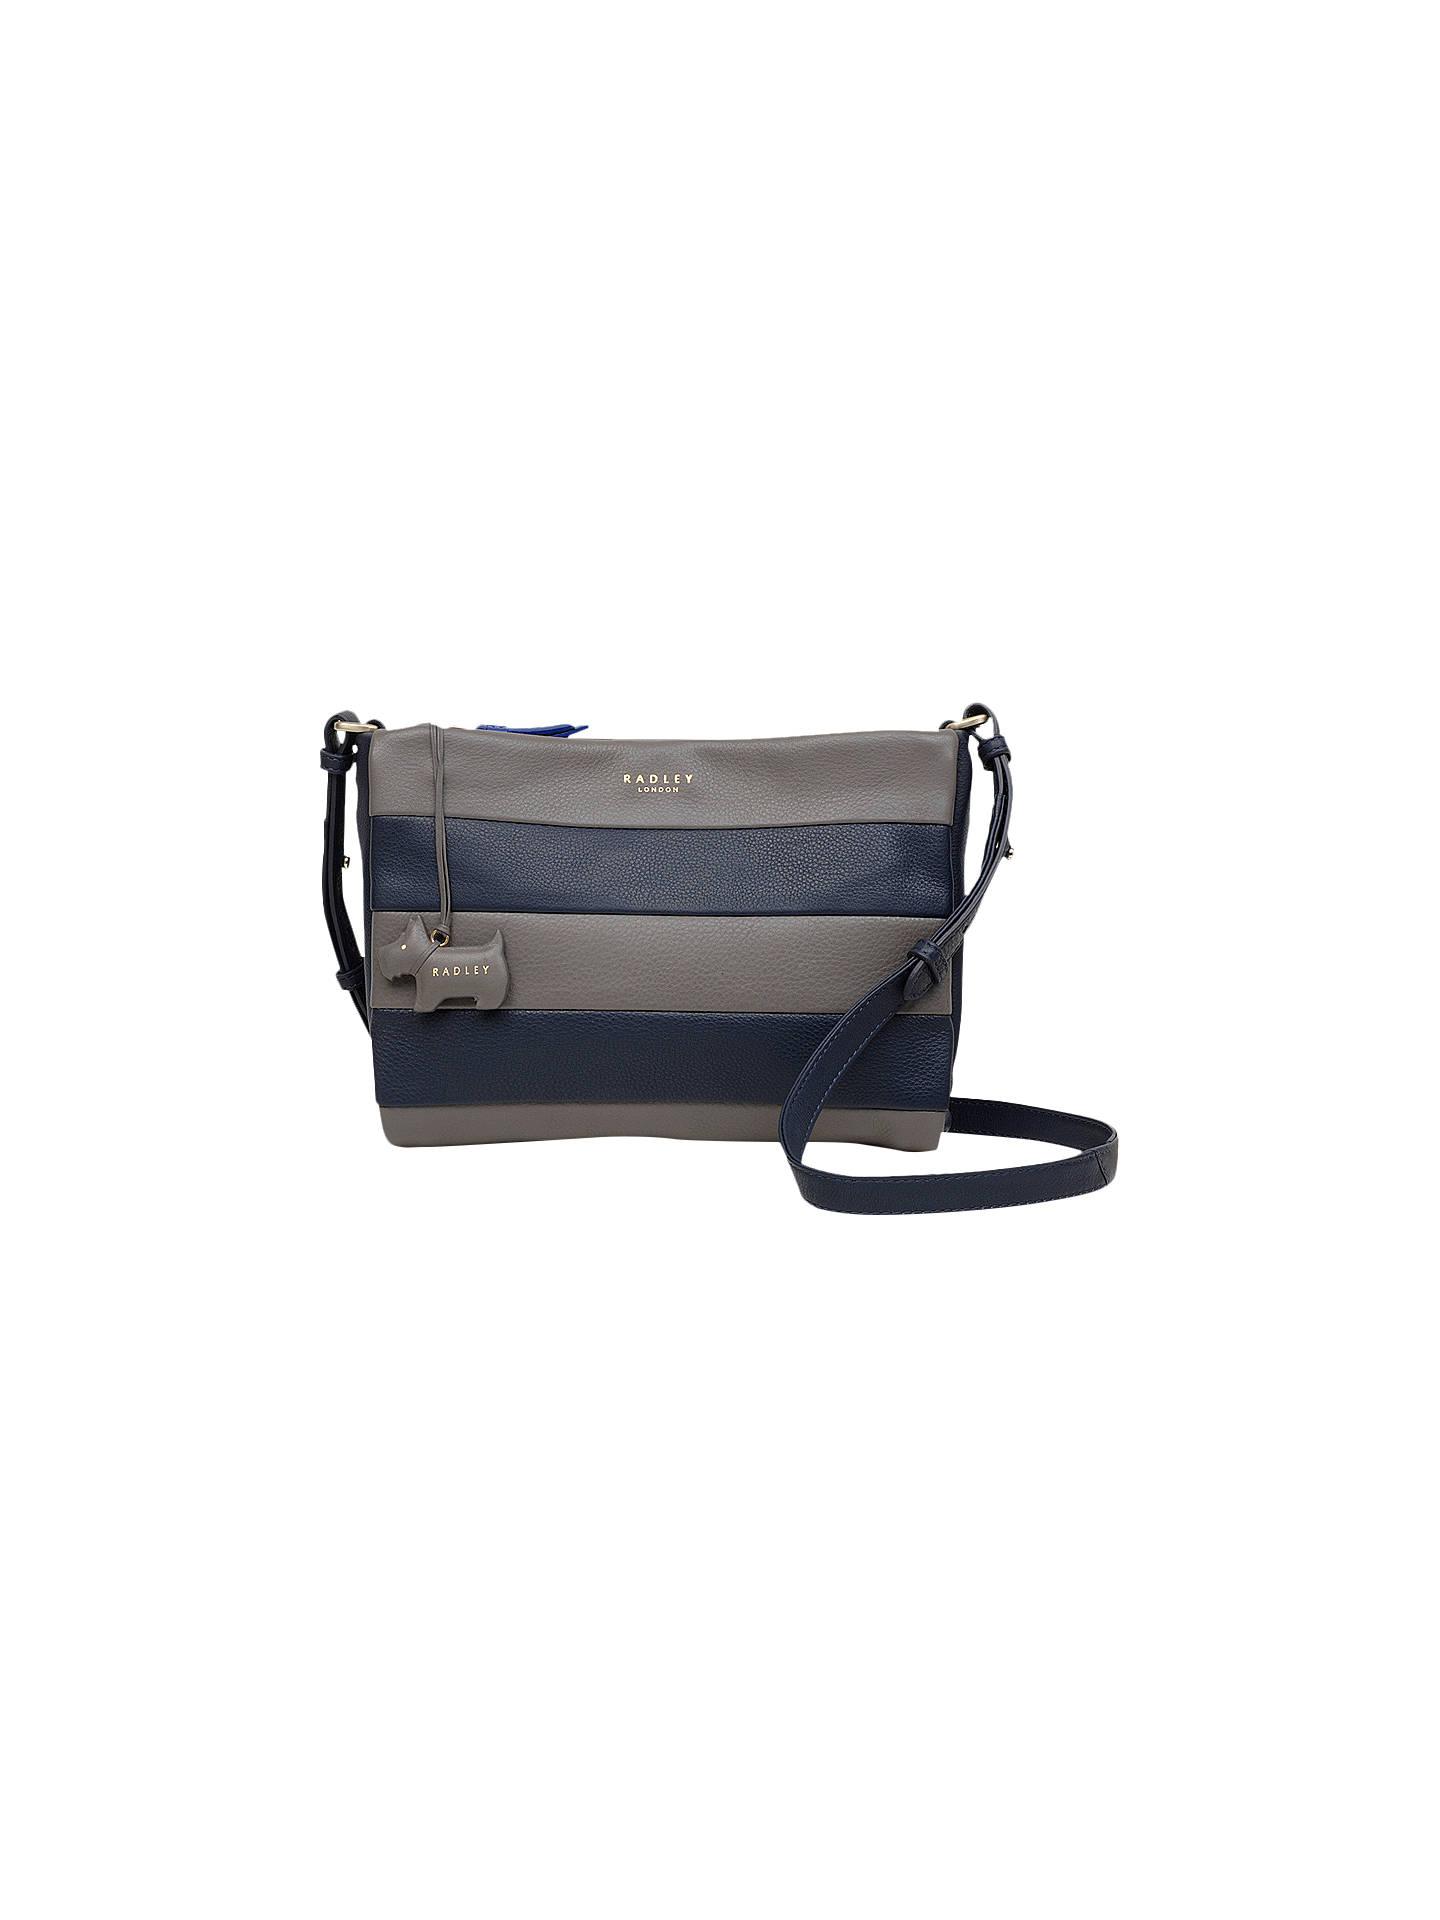 Radley Syon Park Medium Leather Cross Body Bag Grey Navy Online At Johnlewis